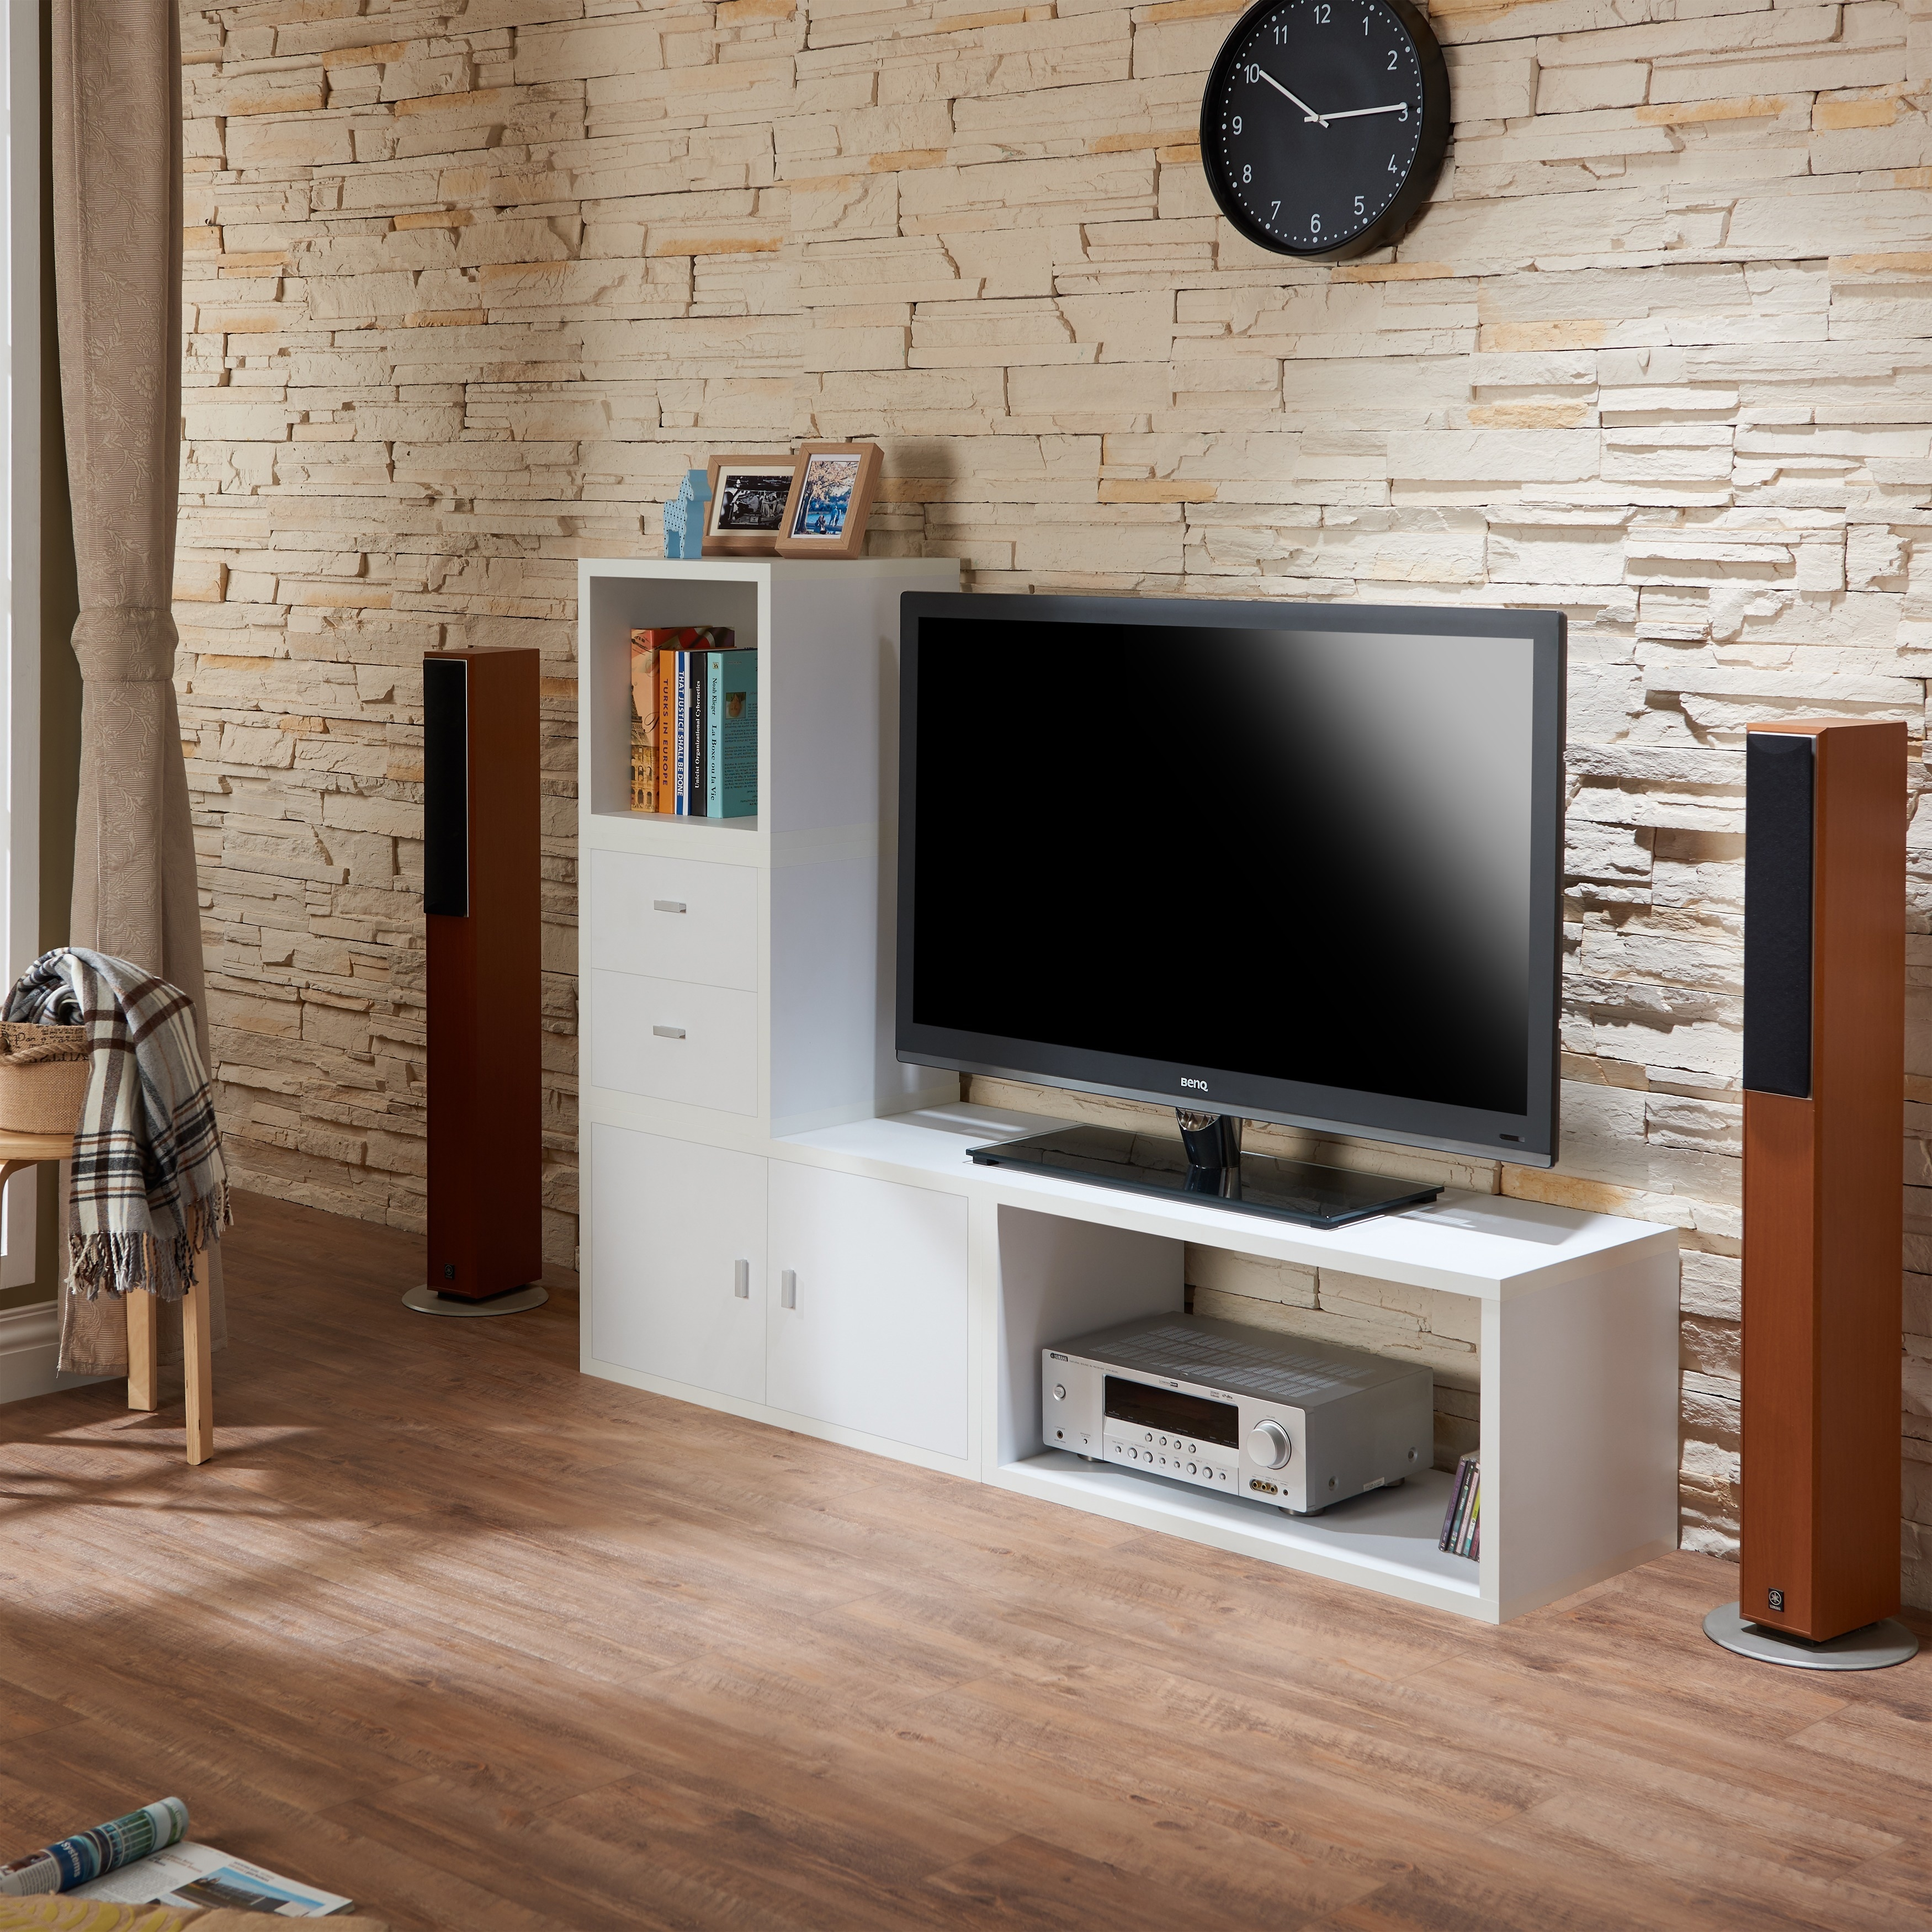 Furniture of america allure modular storage cabinet in white set of 4